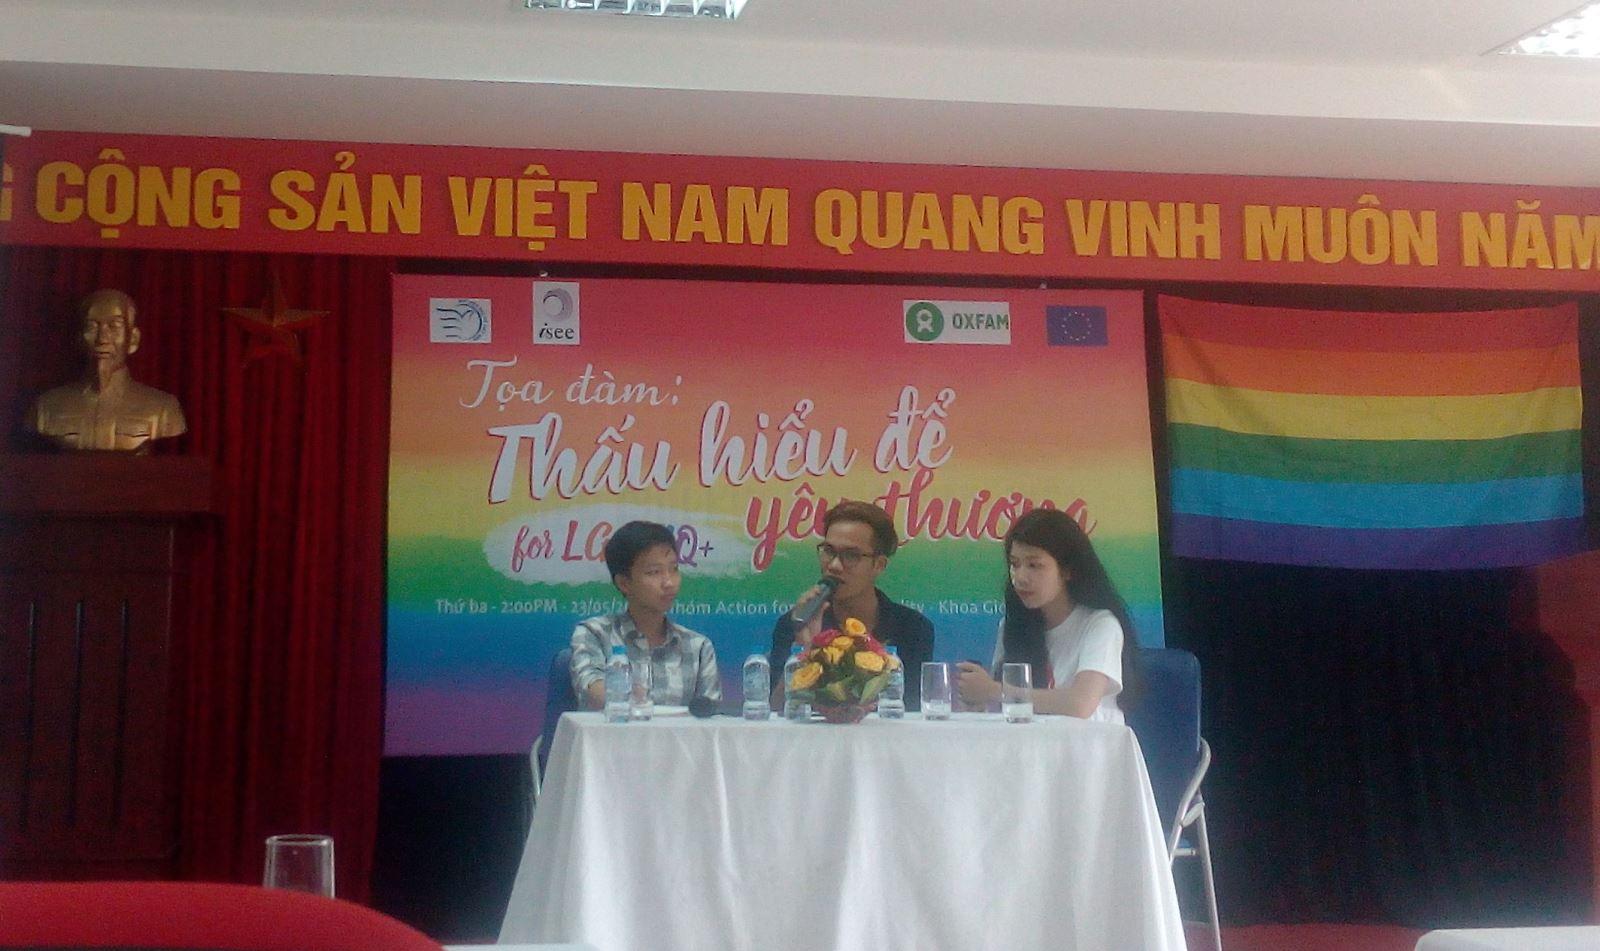 Vietnam university seminar: Creating an LGBT-inclusive school climate